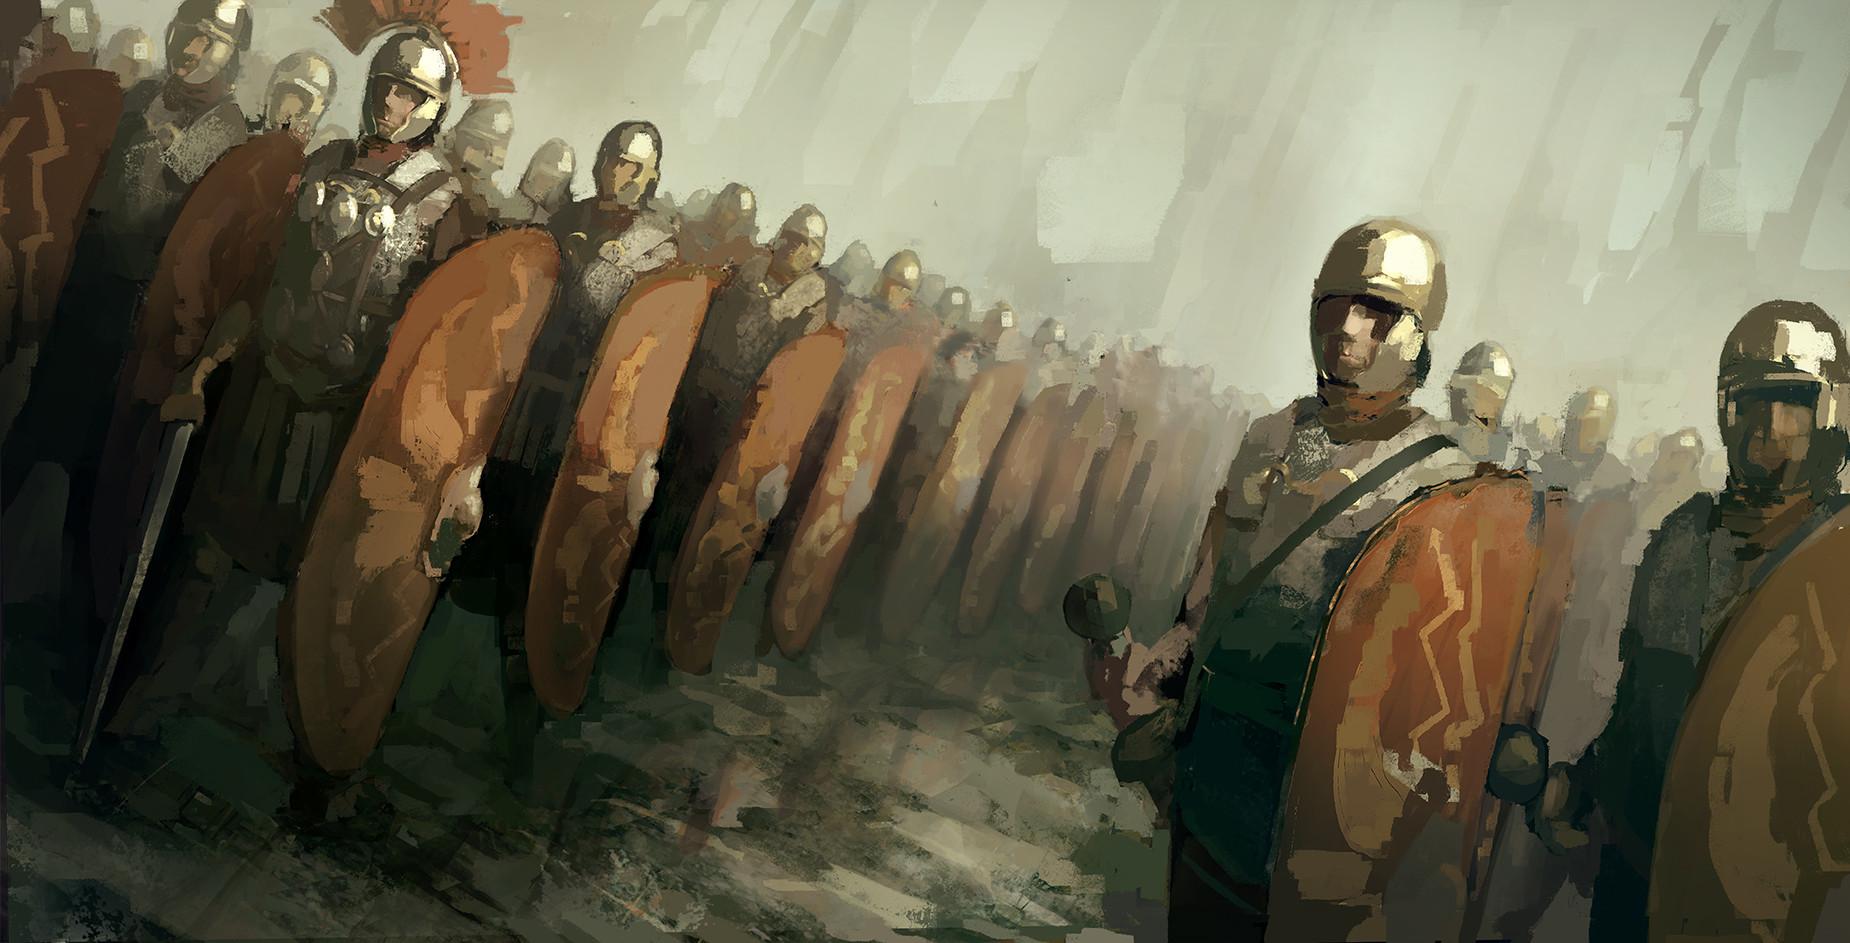 Jaromir hrivnac 201800825 legion